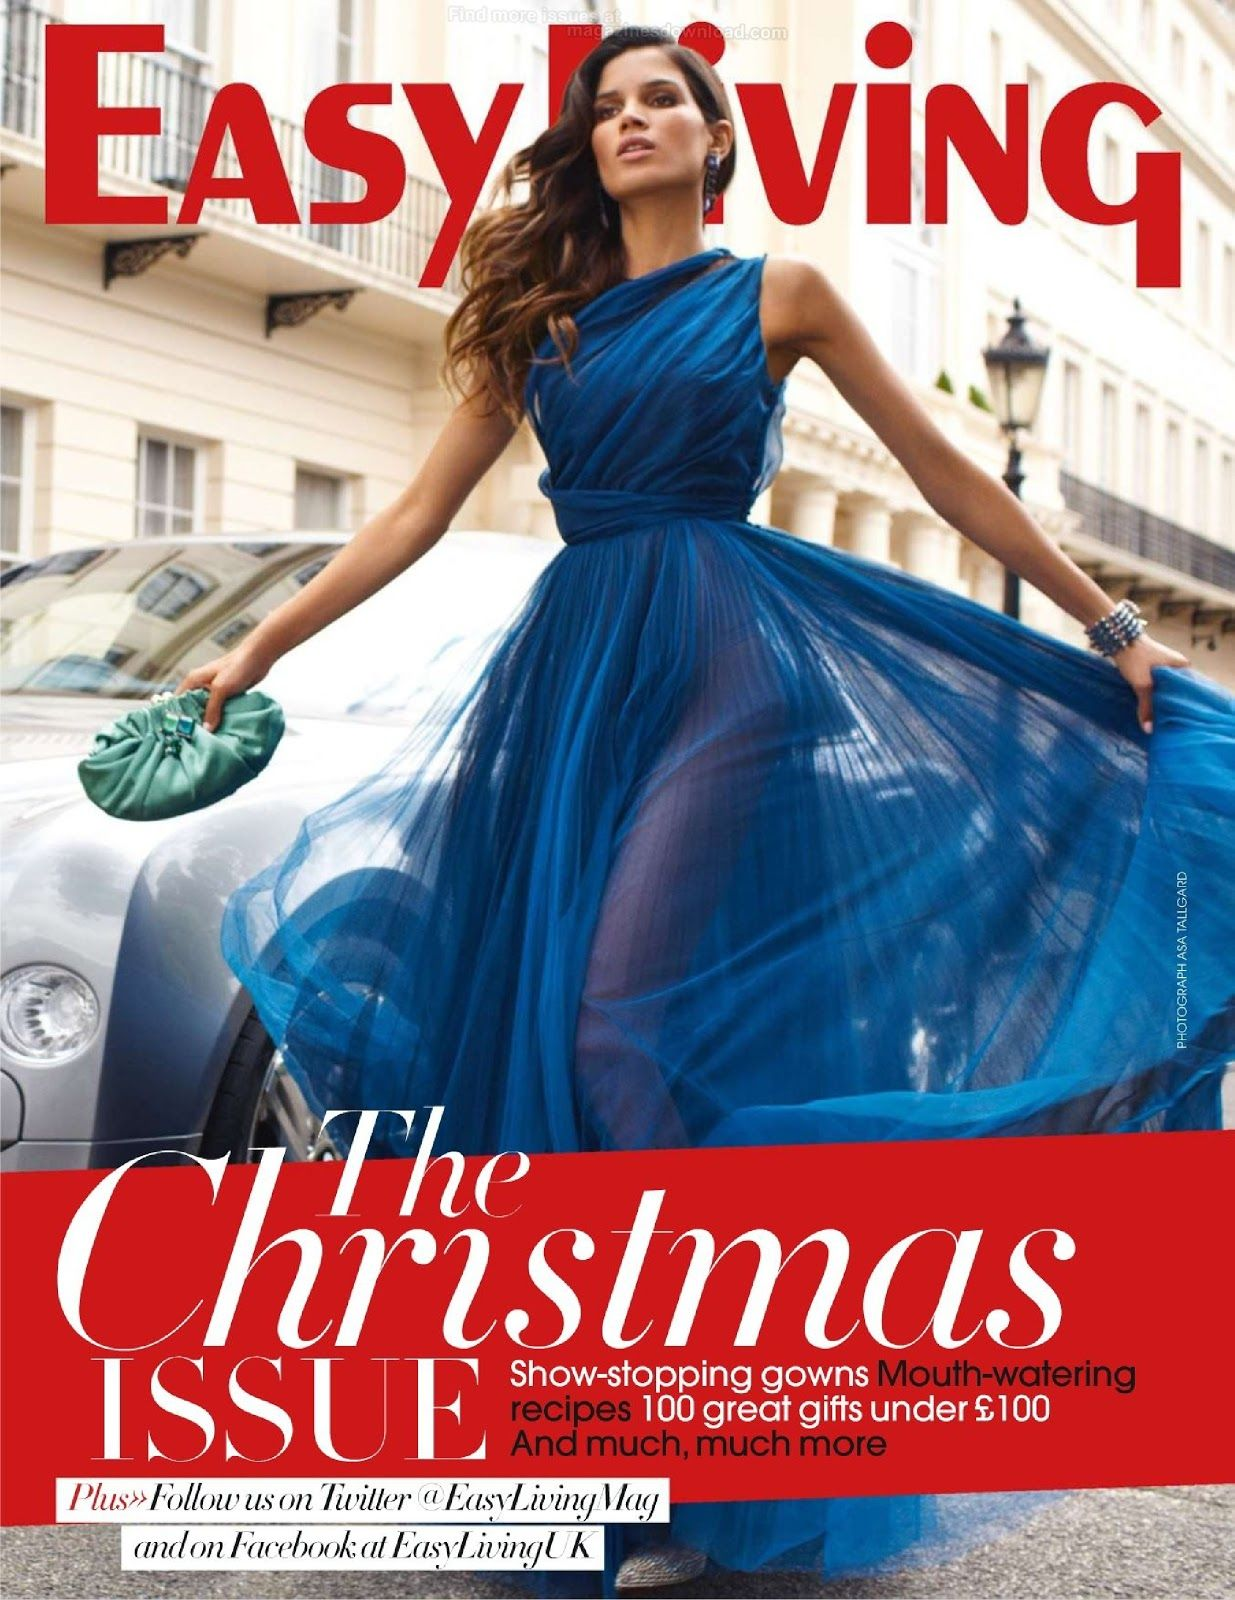 Raica-Oliveira-in-Easy-Living-December-2012-1